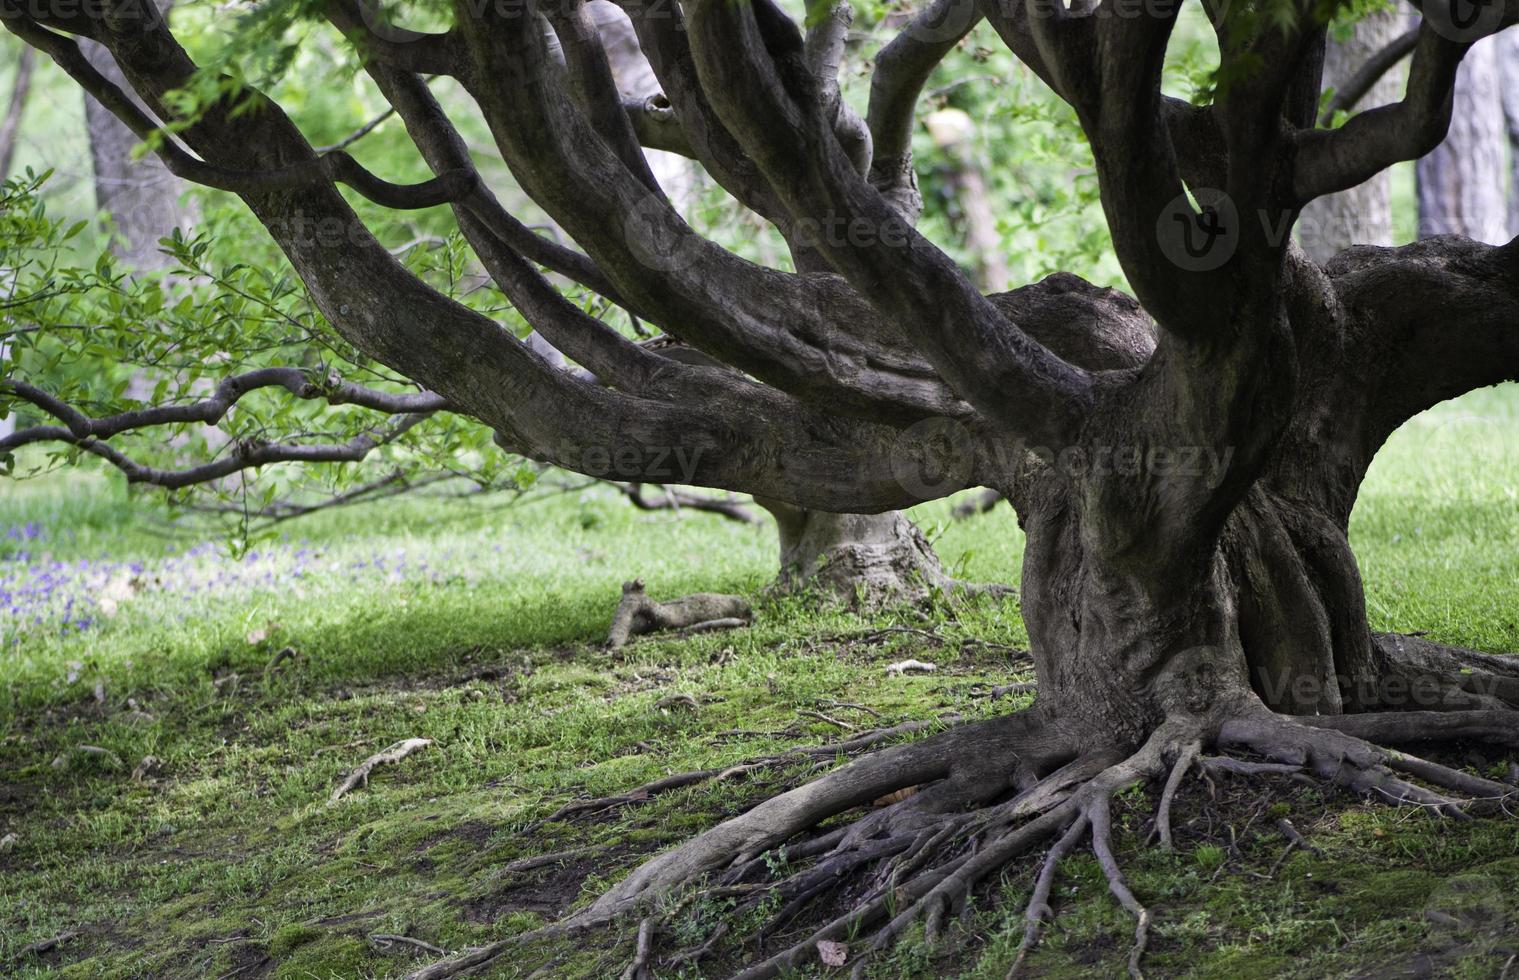 velha árvore com raízes expostas foto